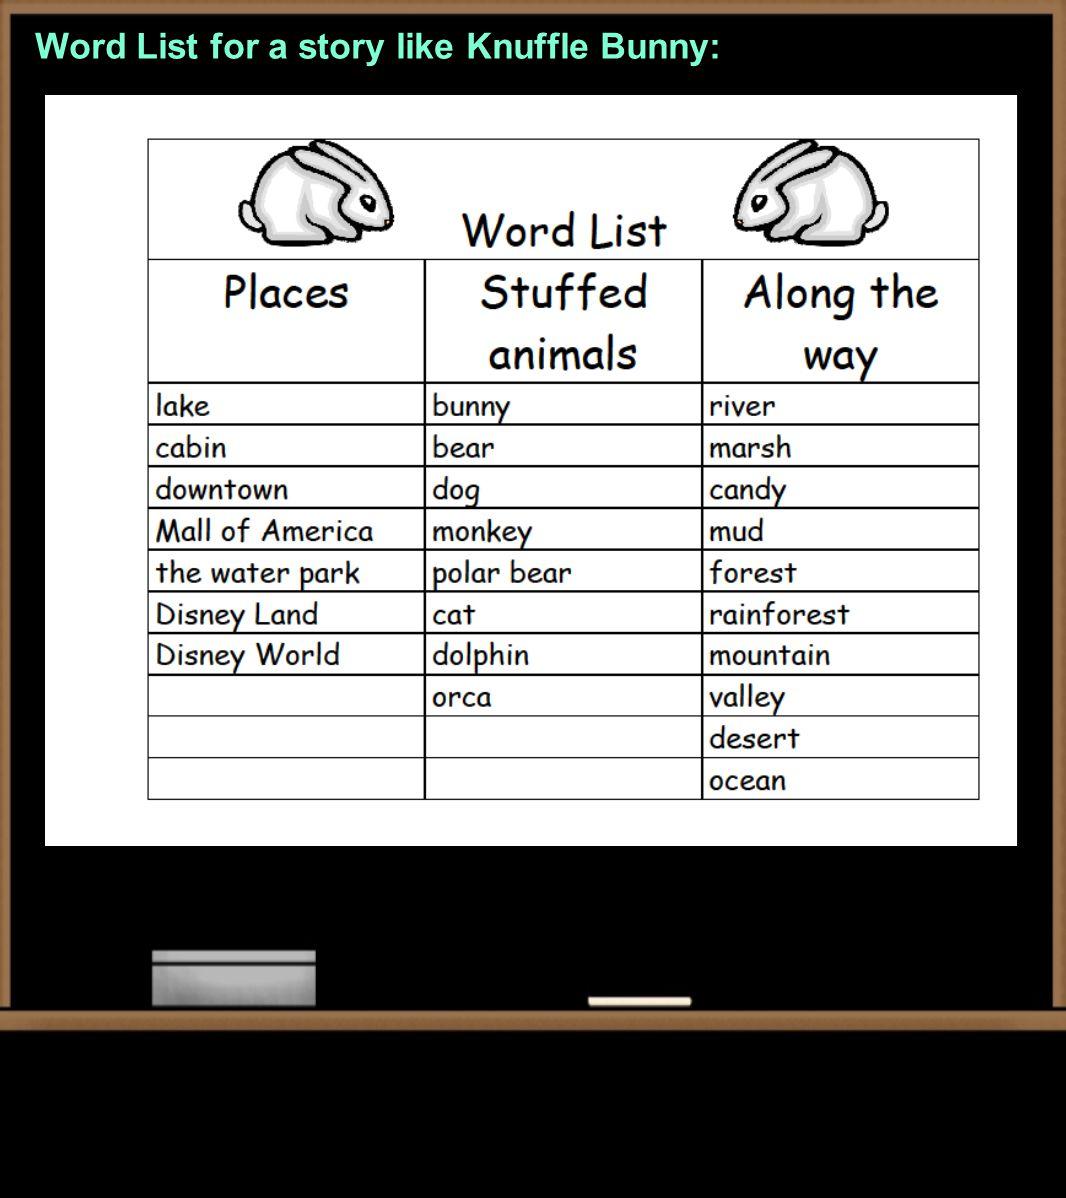 Word List for a story like Knuffle Bunny: